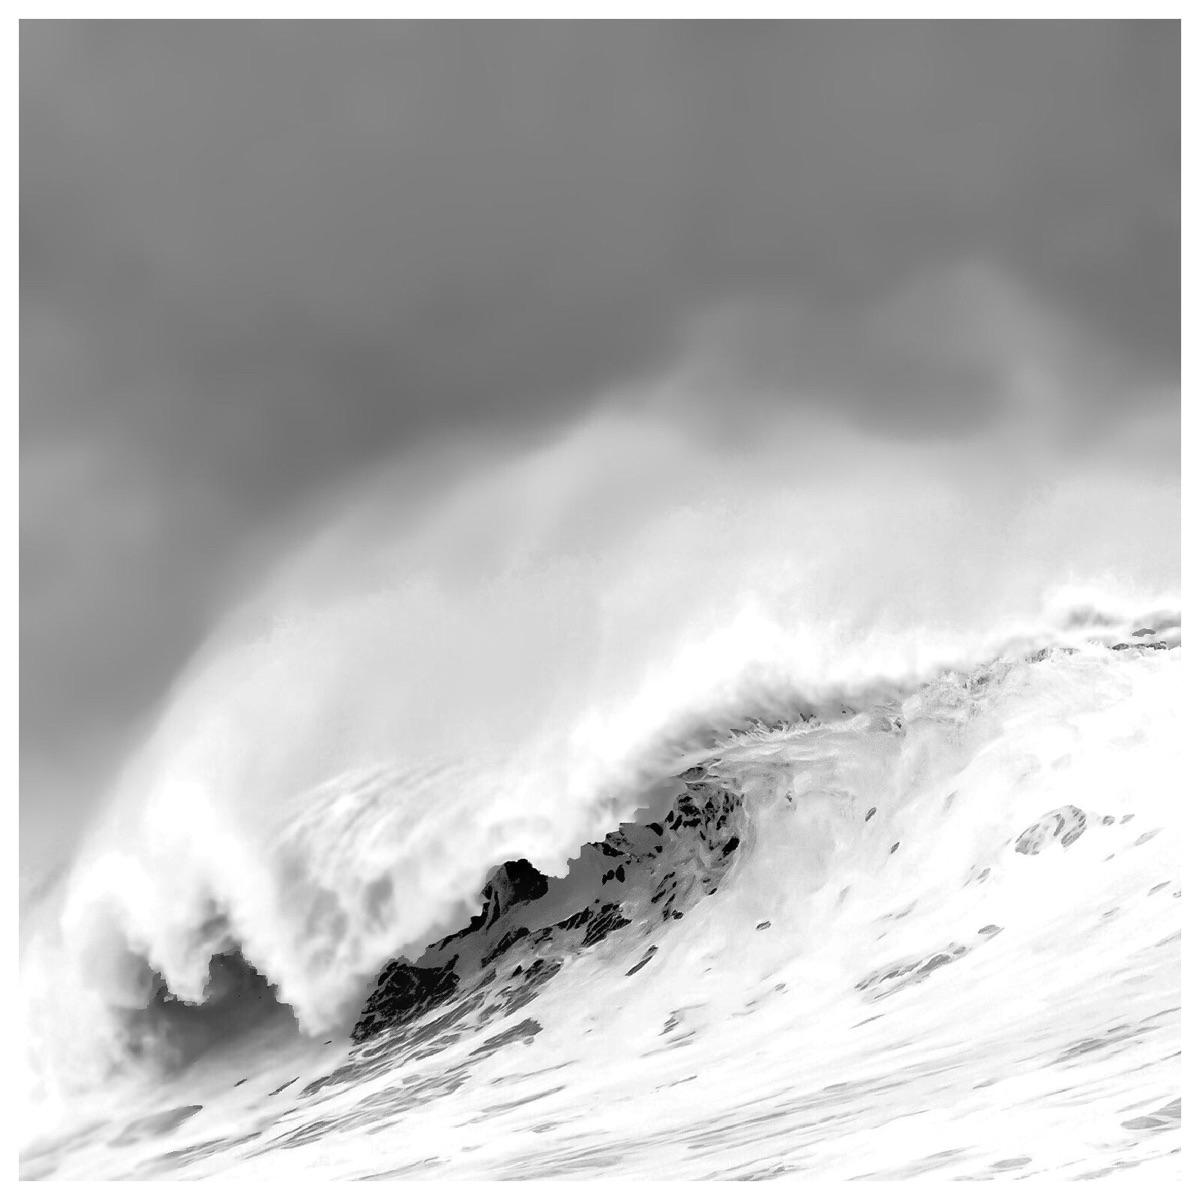 sea, wind... Wave La mer, le ve - murielleetc | ello